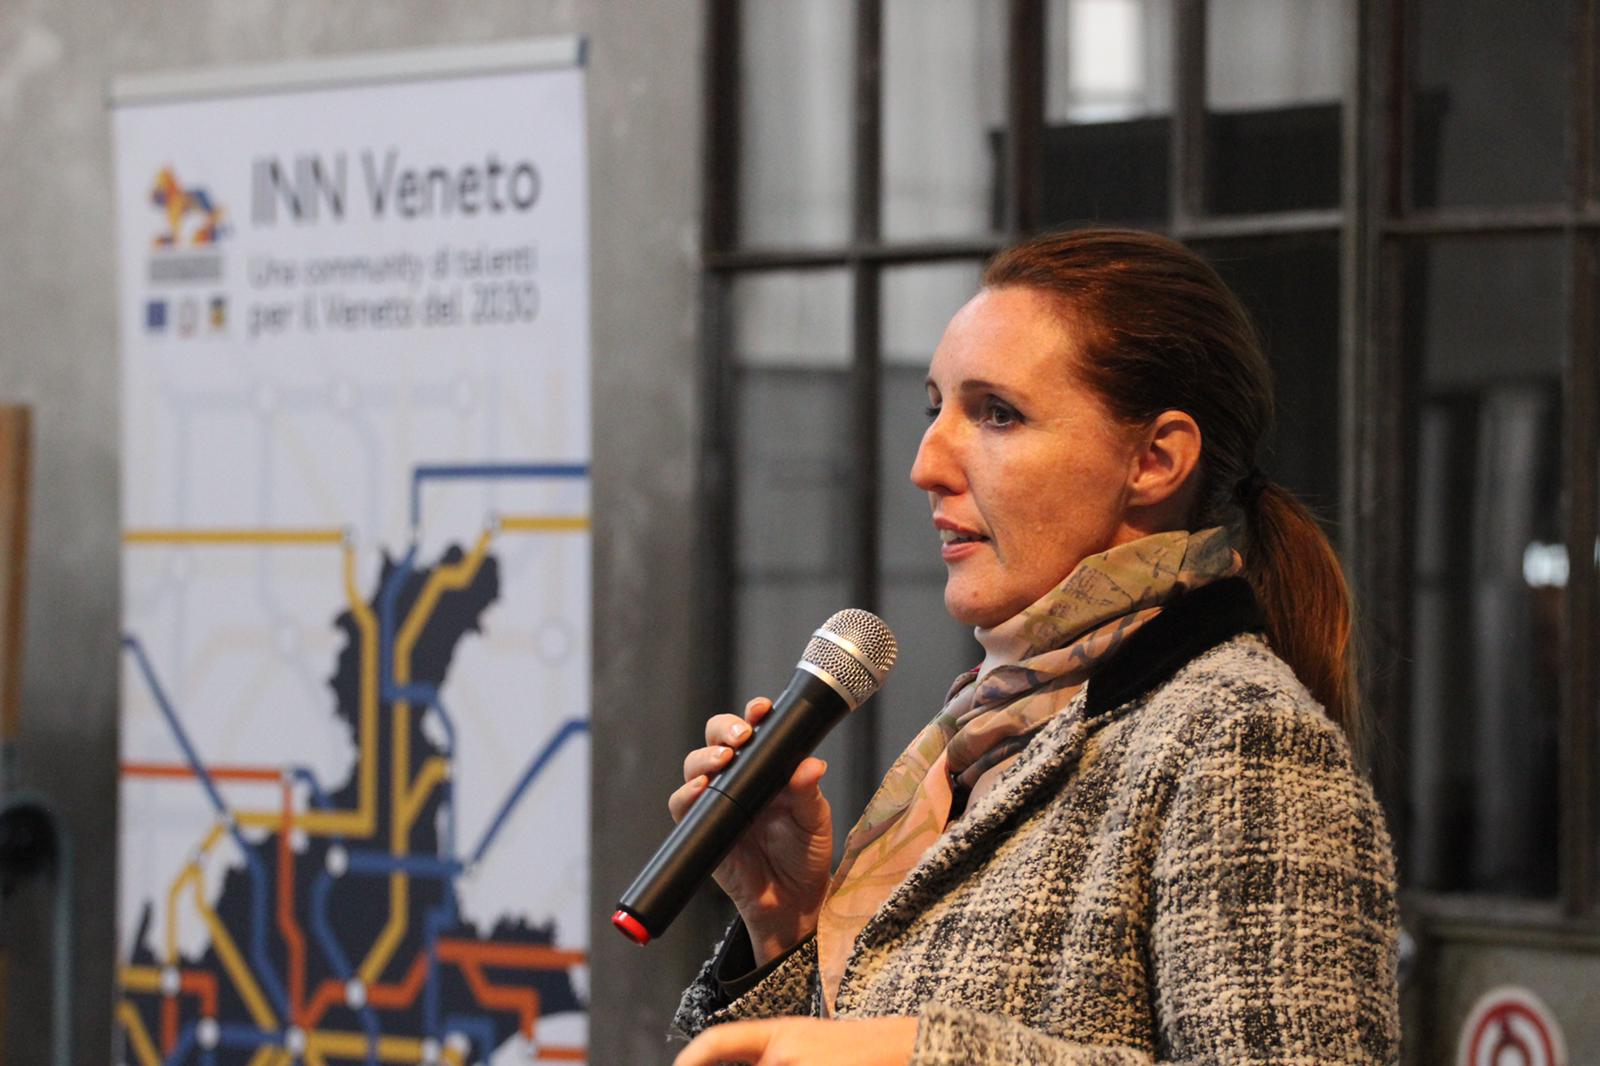 donazzan fondi europei its academy turismo